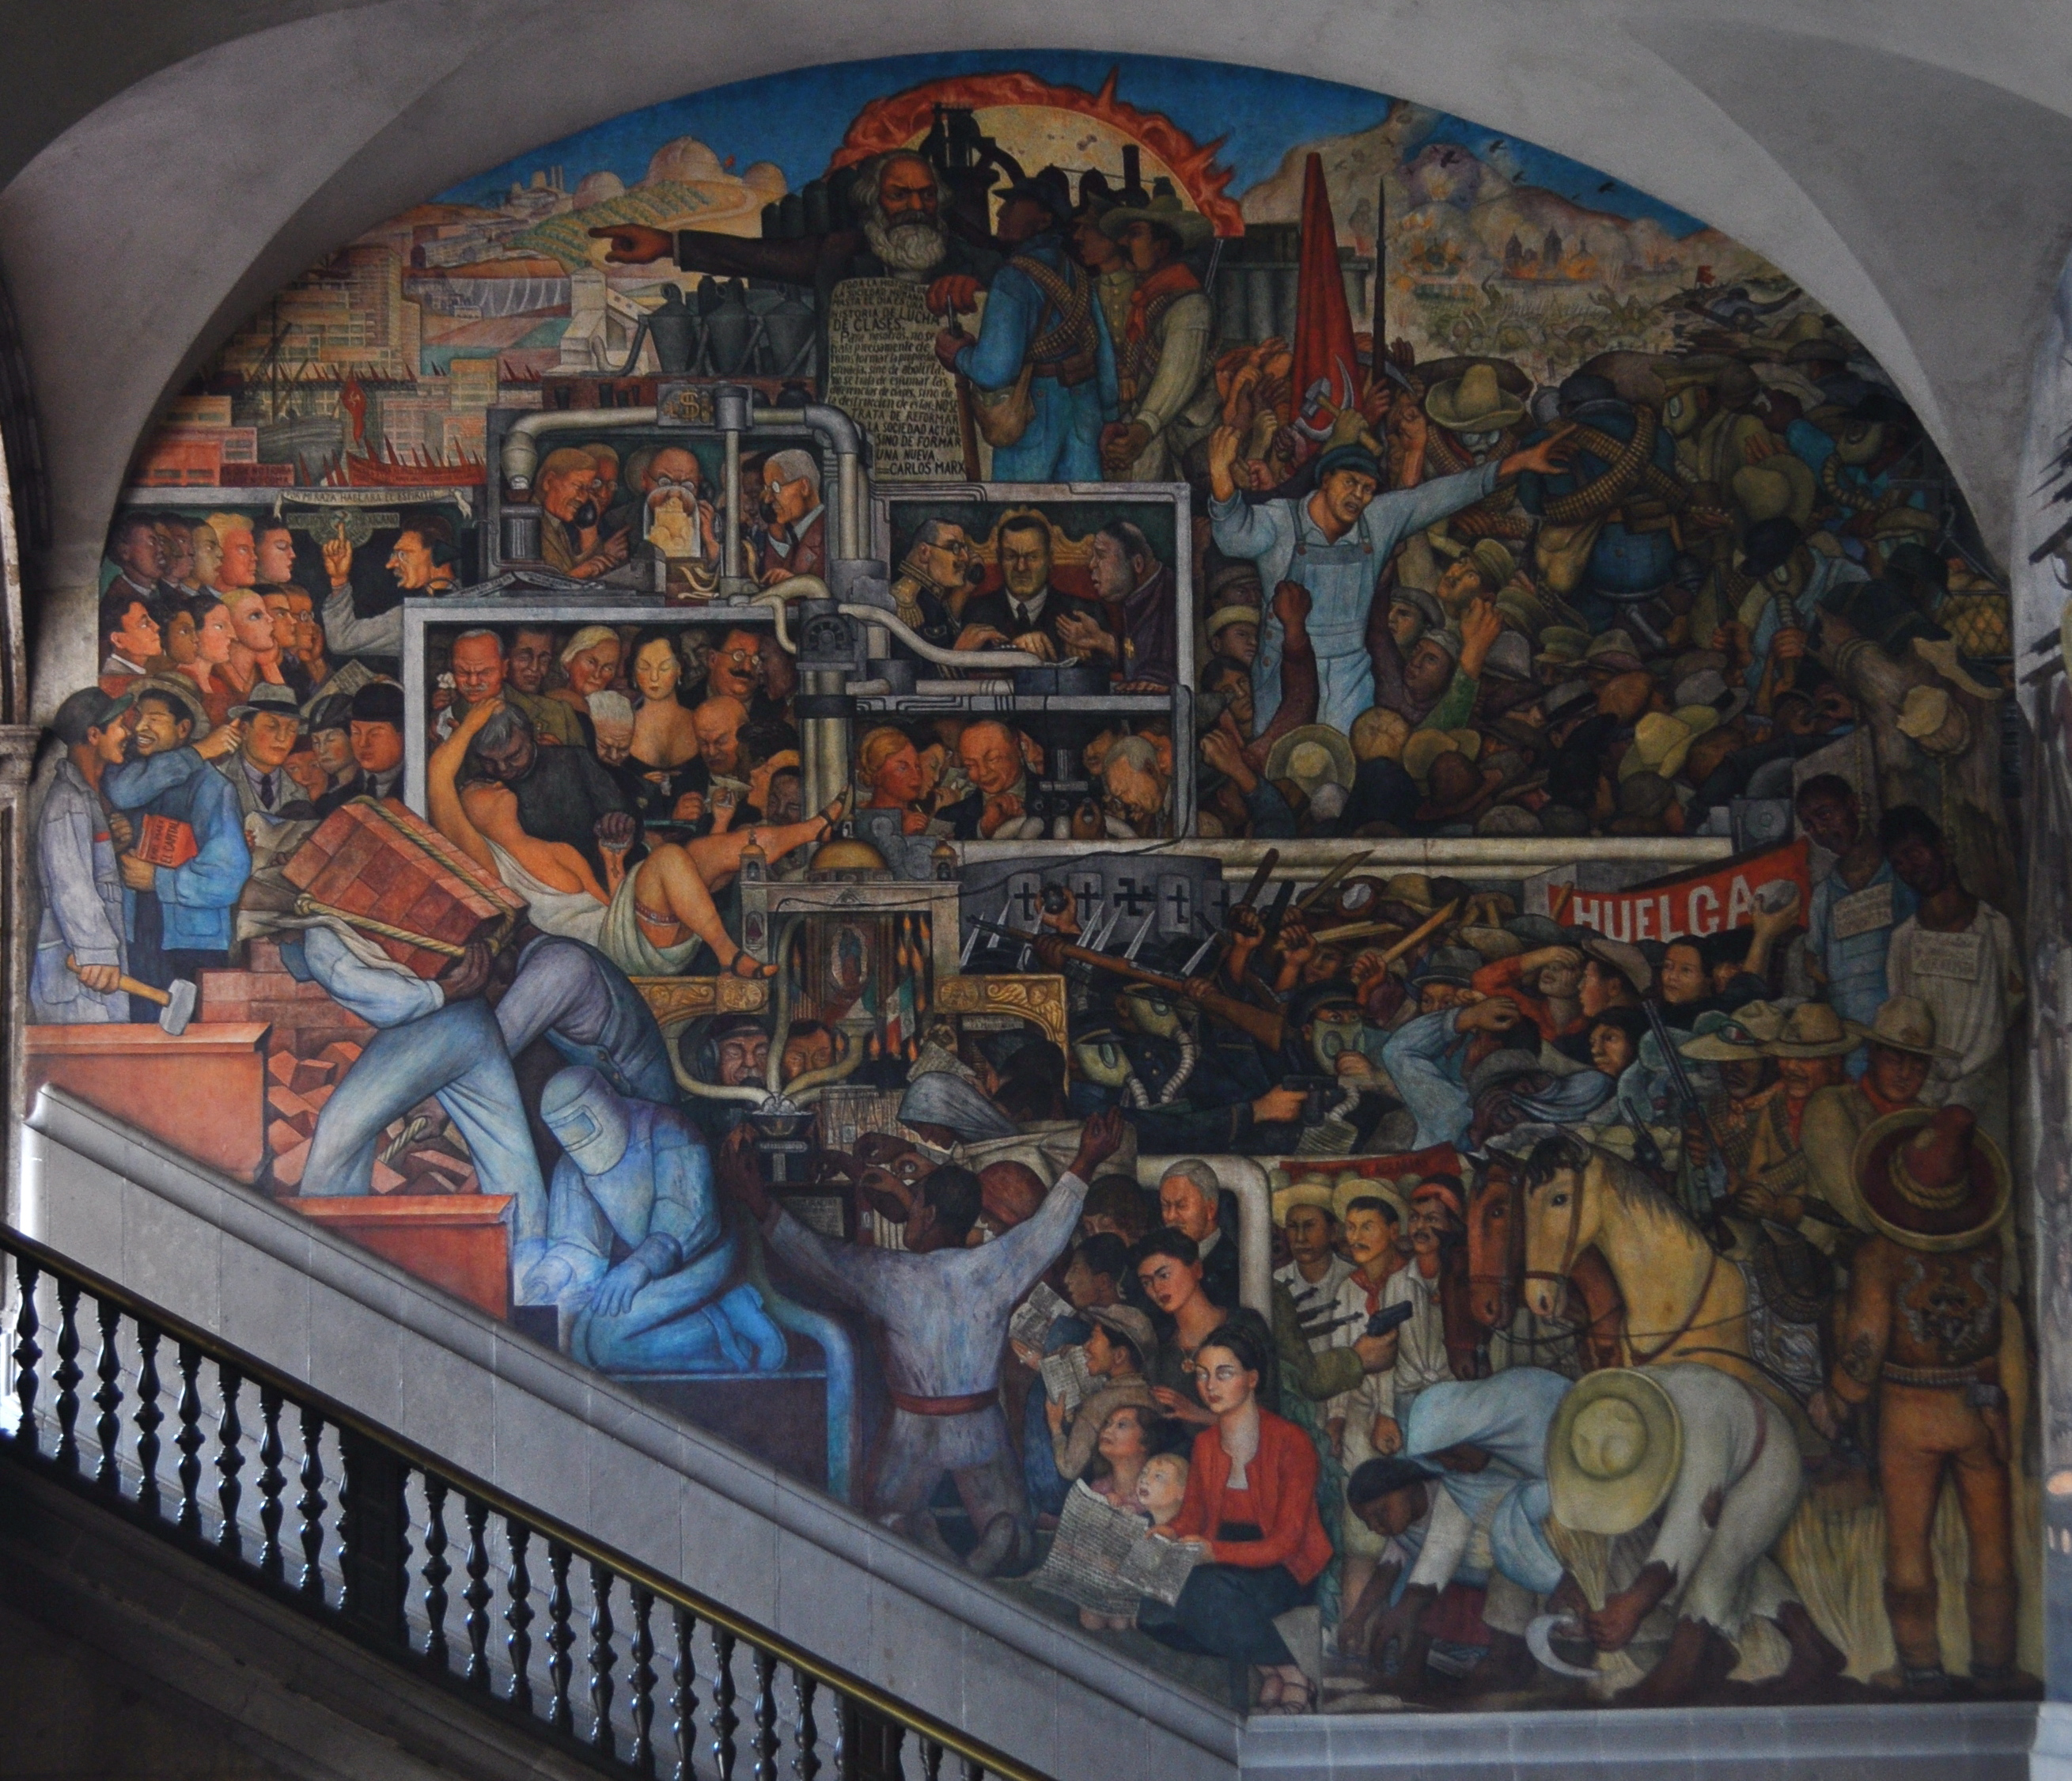 File el m xico de hoy y ma ana 2011 jpg wikimedia commons for El mural jalisco